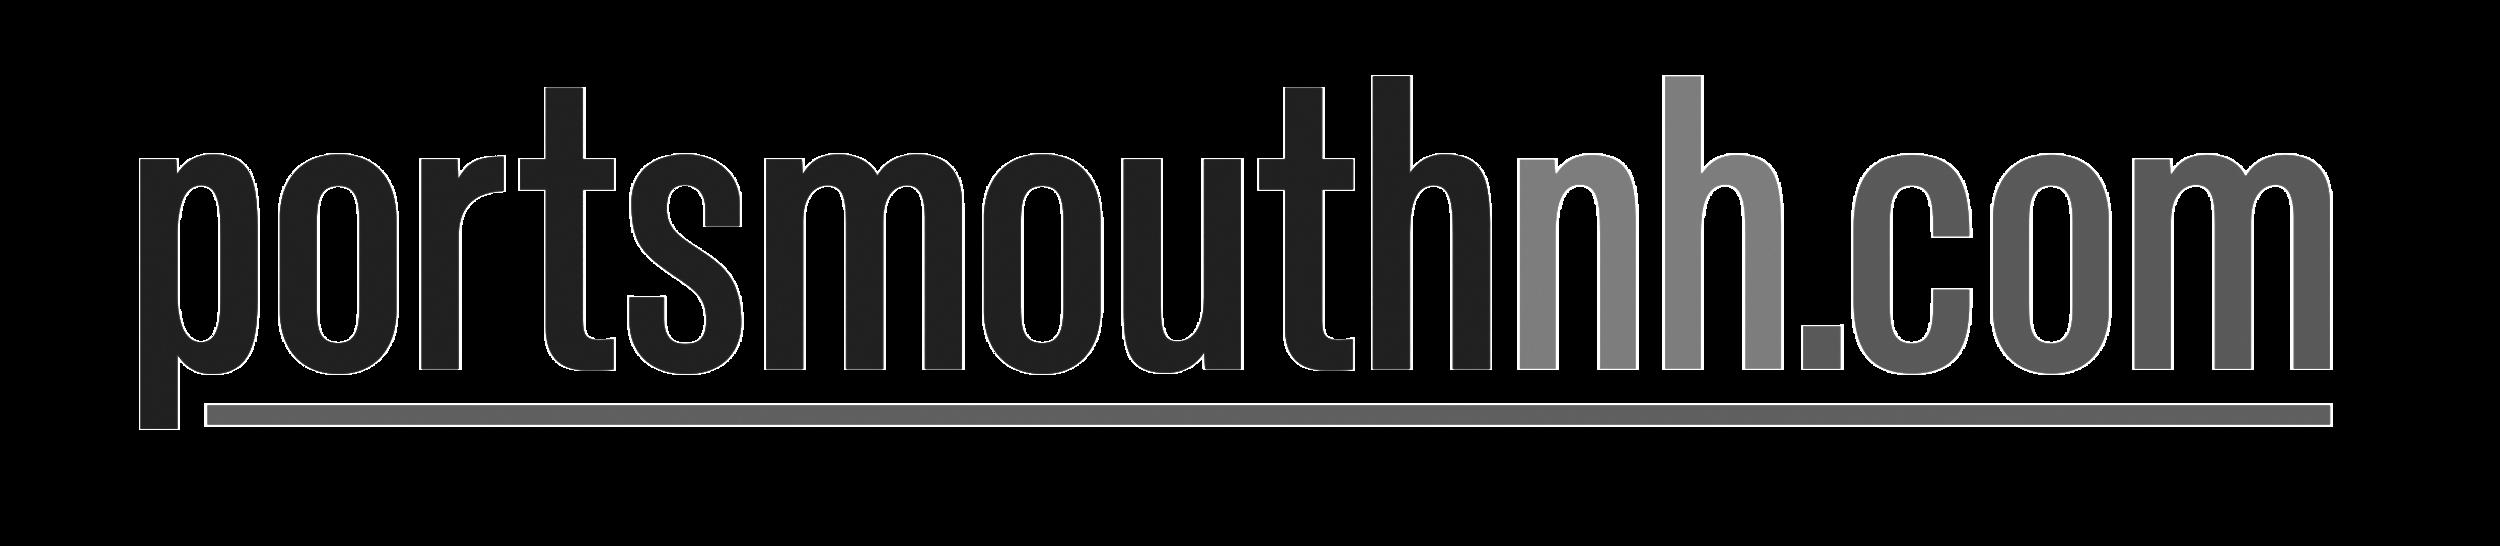 Portsmouth-NH-logo_@2x.png